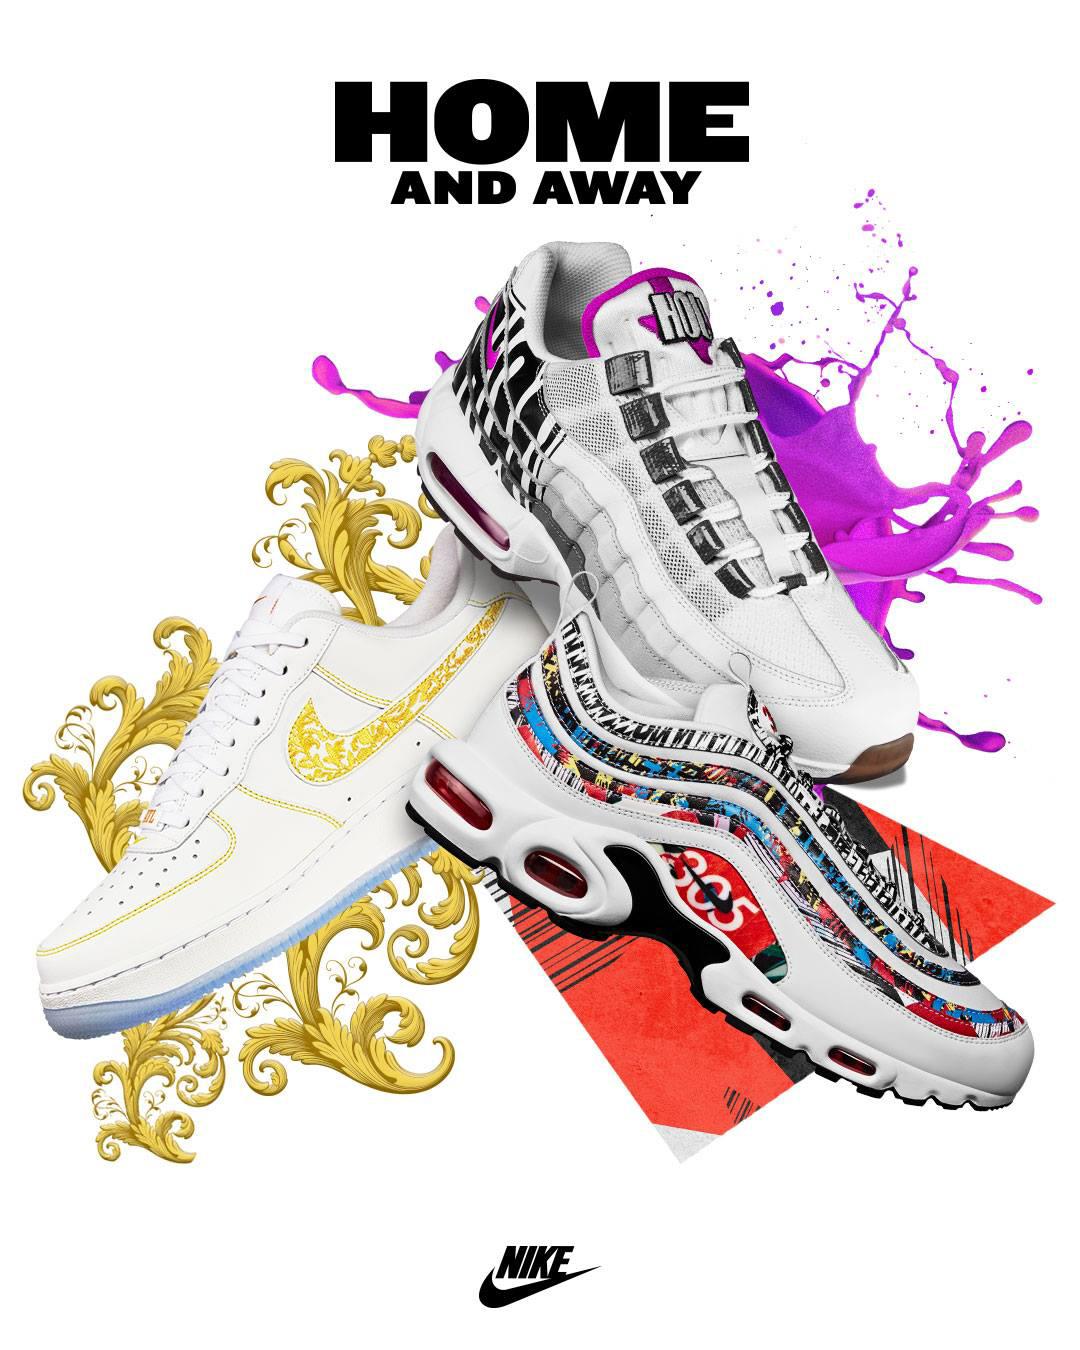 nike-air-city-pride-sneakers